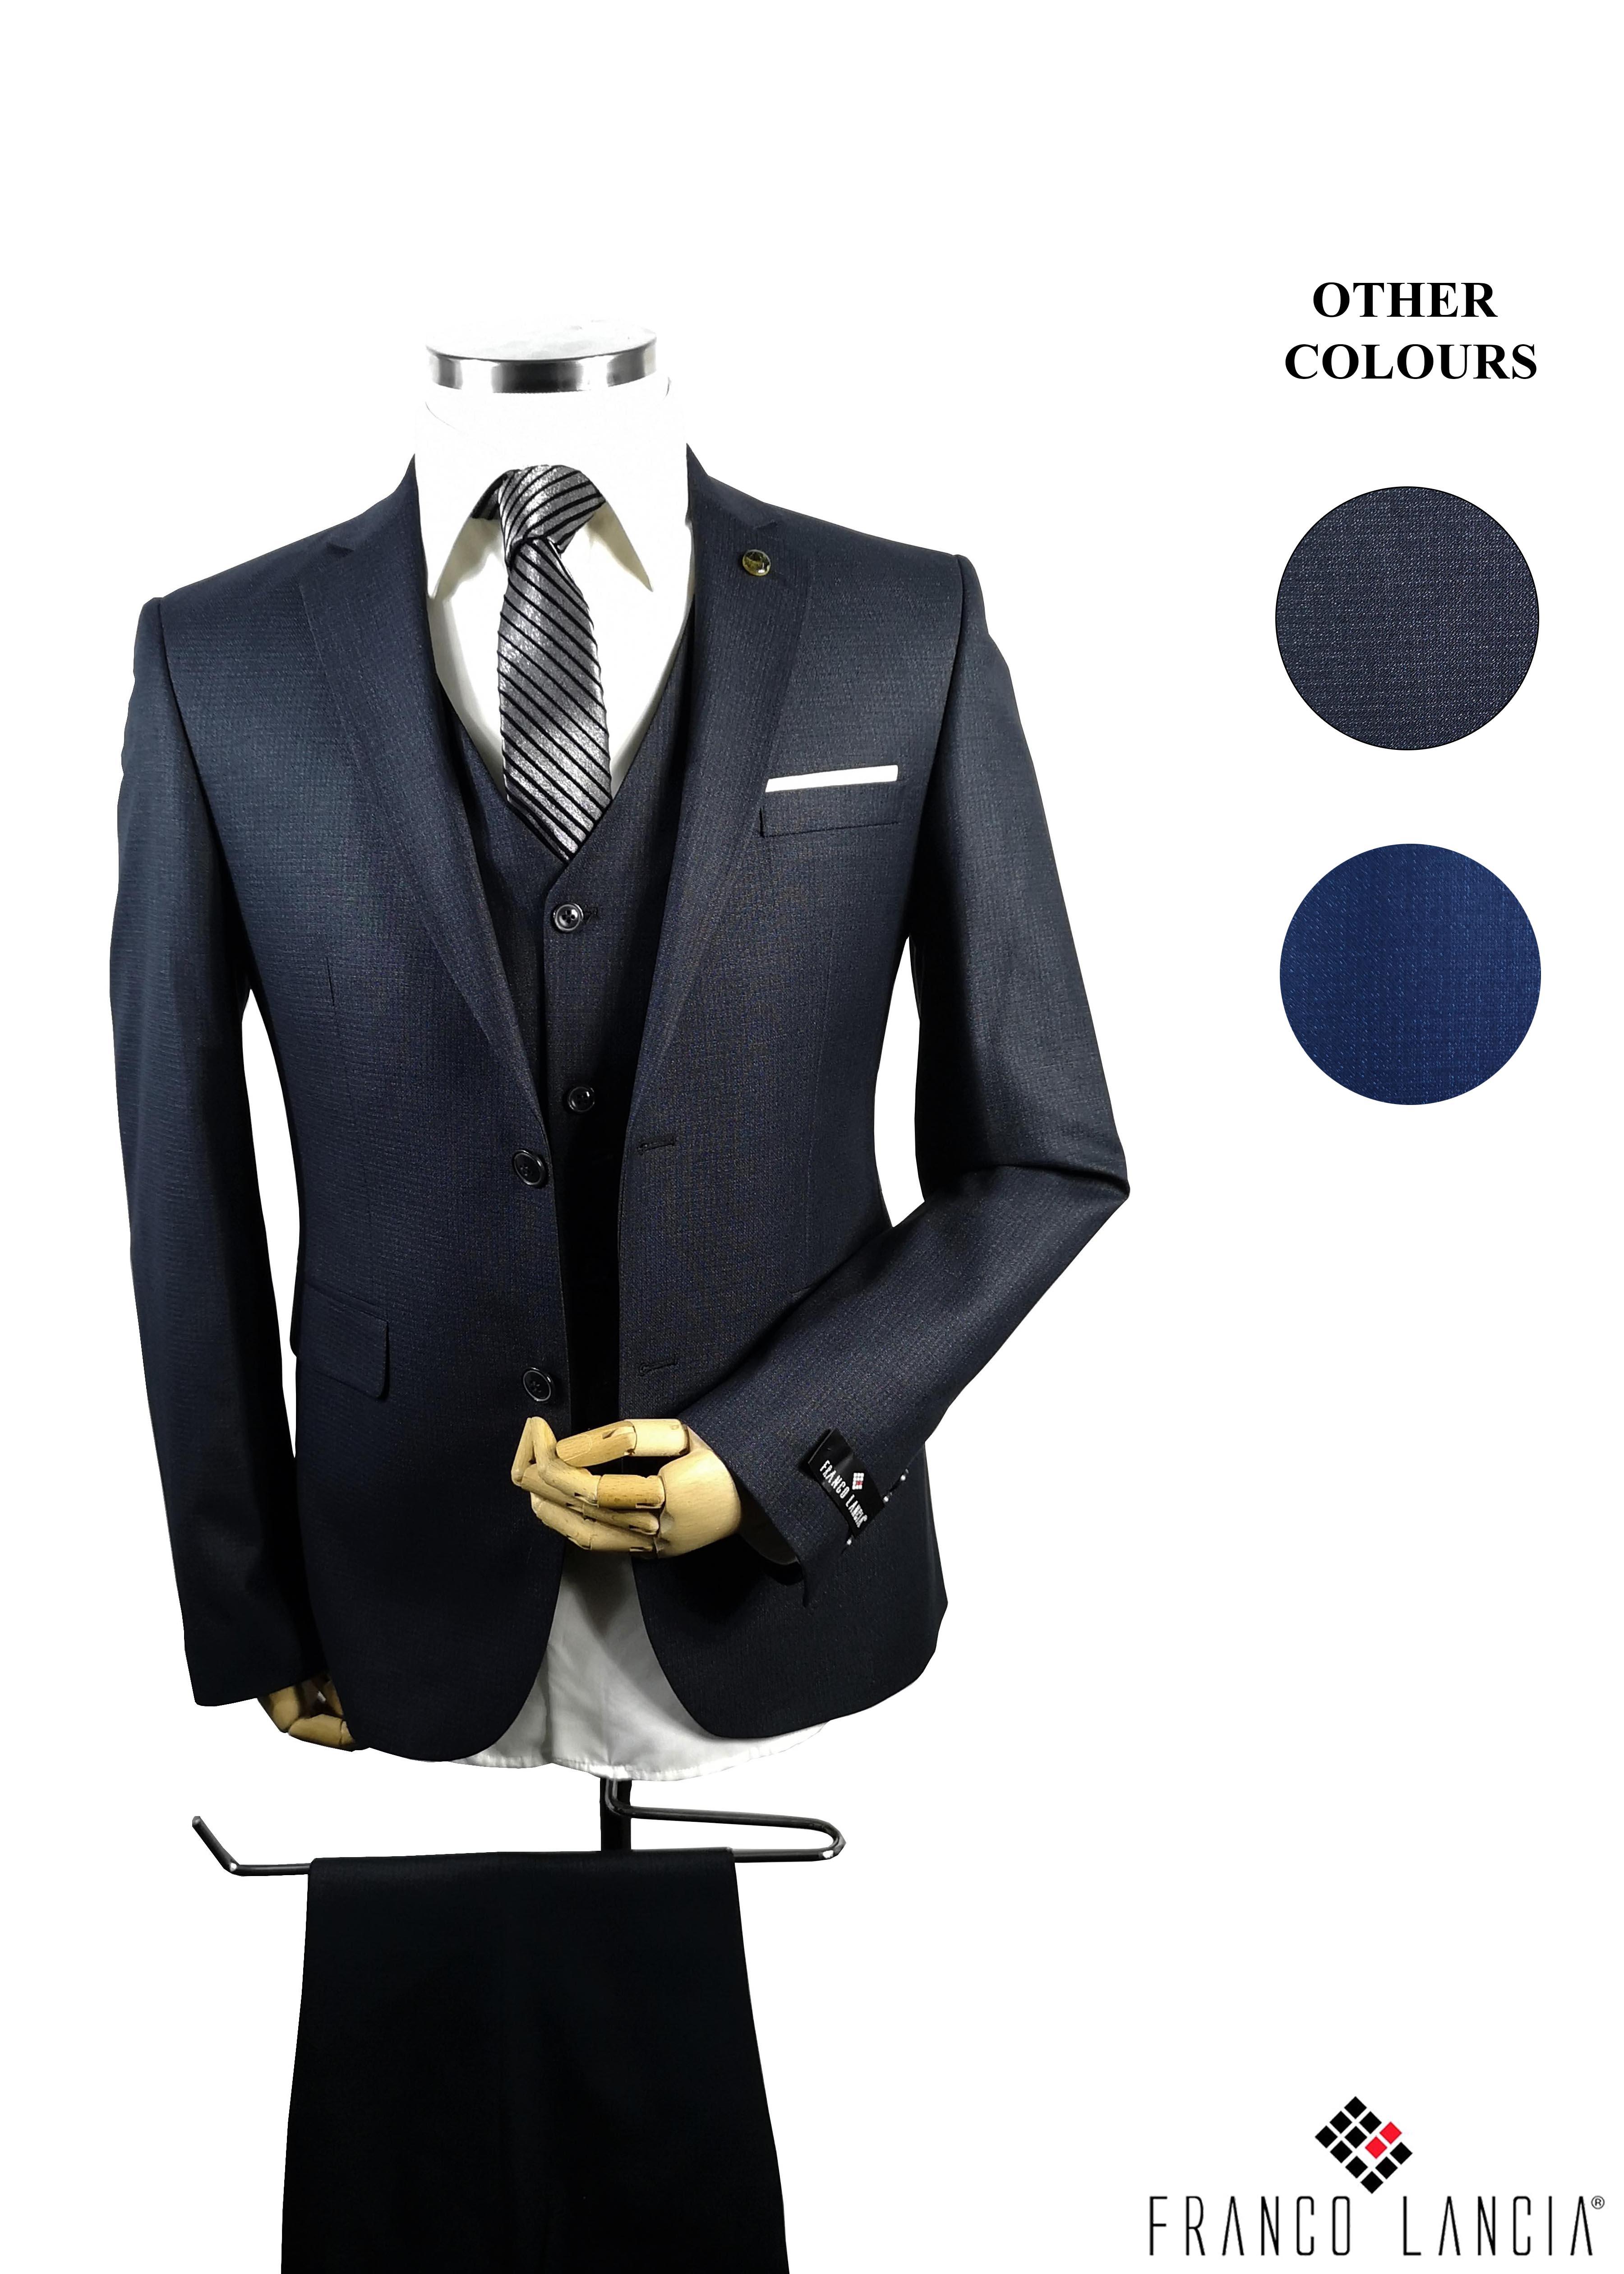 3 Piece Suit Model and Colors